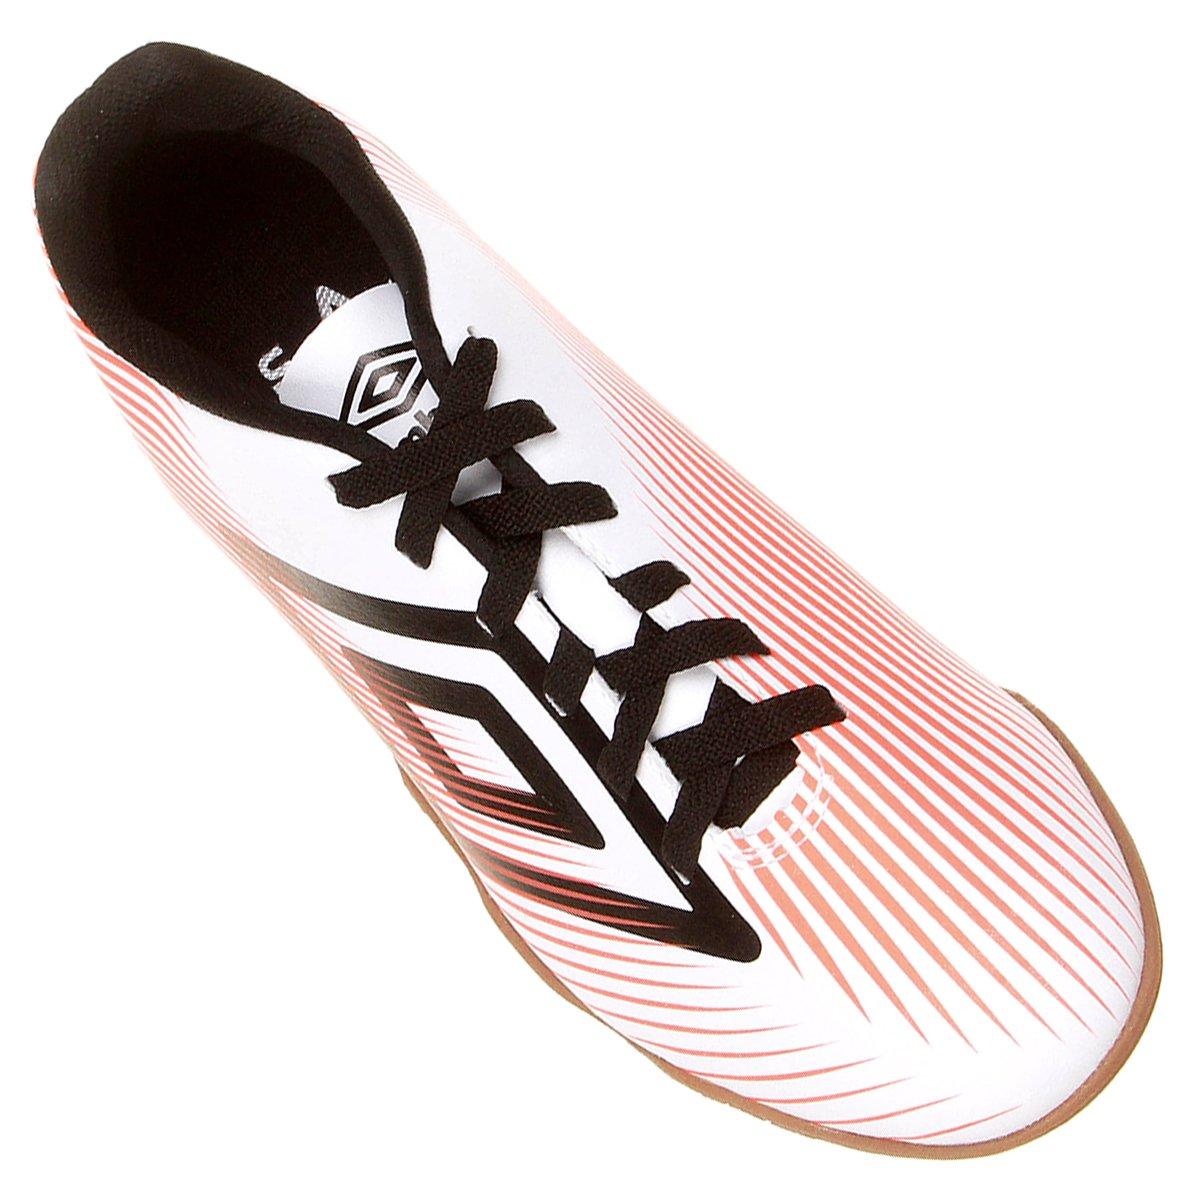 Chuteira Futsal Umbro Speed II Masculina - Branco e Preto - Compre ... f2f9b1b693510